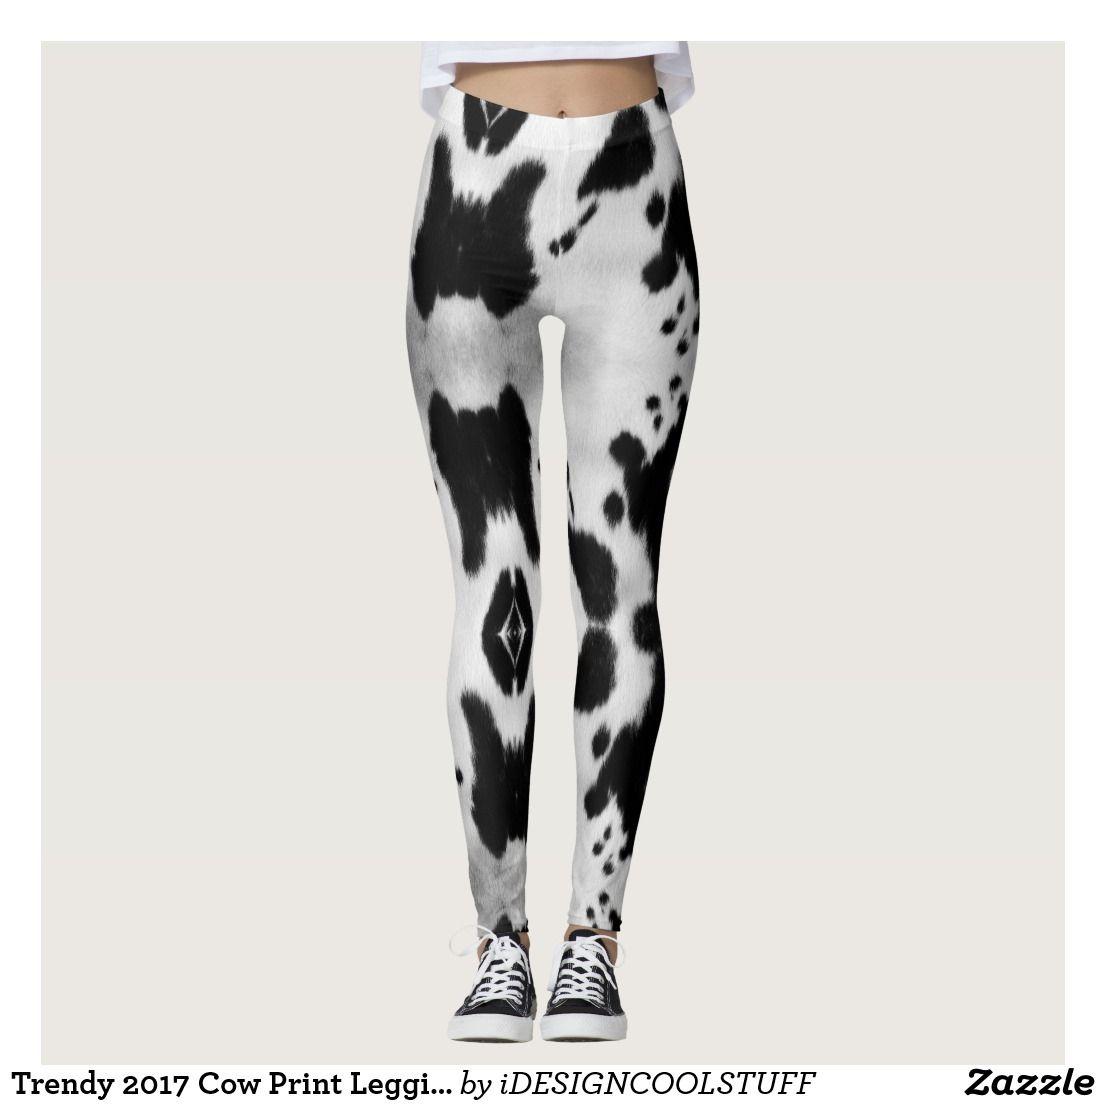 b31d87d6e59dcf Trendy 2017 Cow Print Leggings   Zazzle.com   Printed Leggings ...